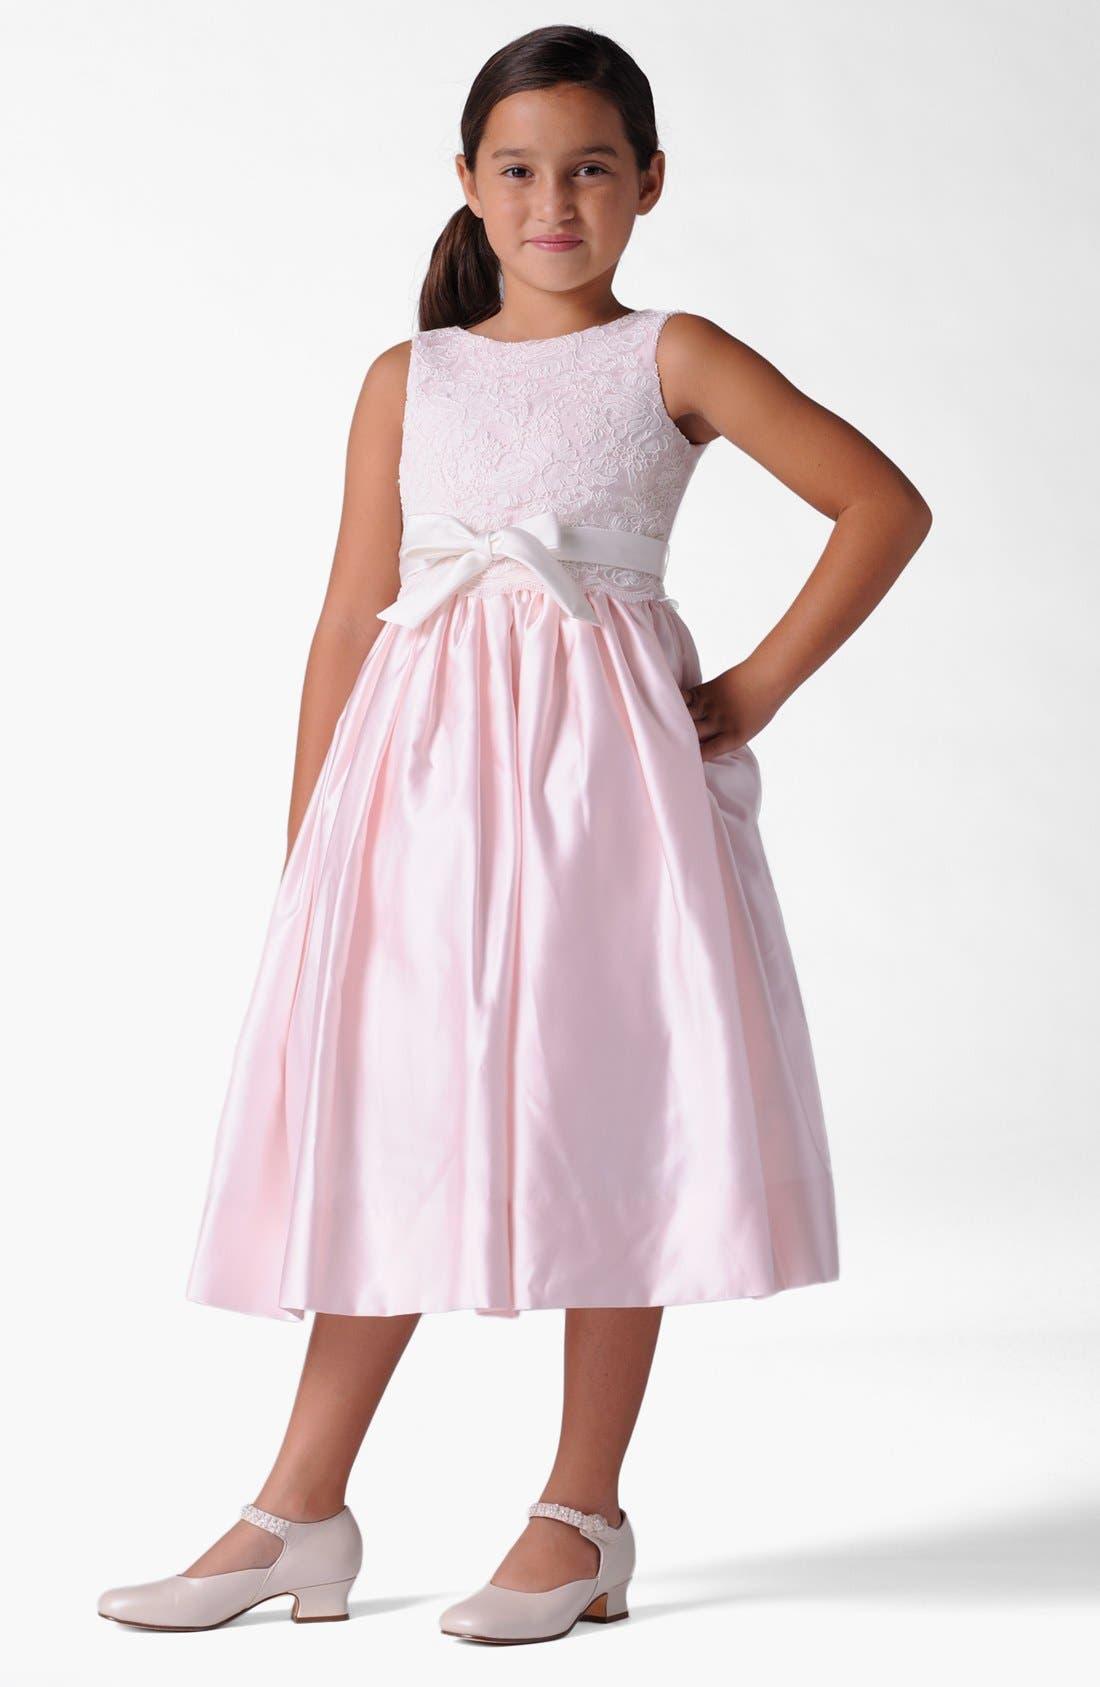 Main Image - Us Angels Lace Dress (Infant, Toddler, Little Girls & Big Girls)